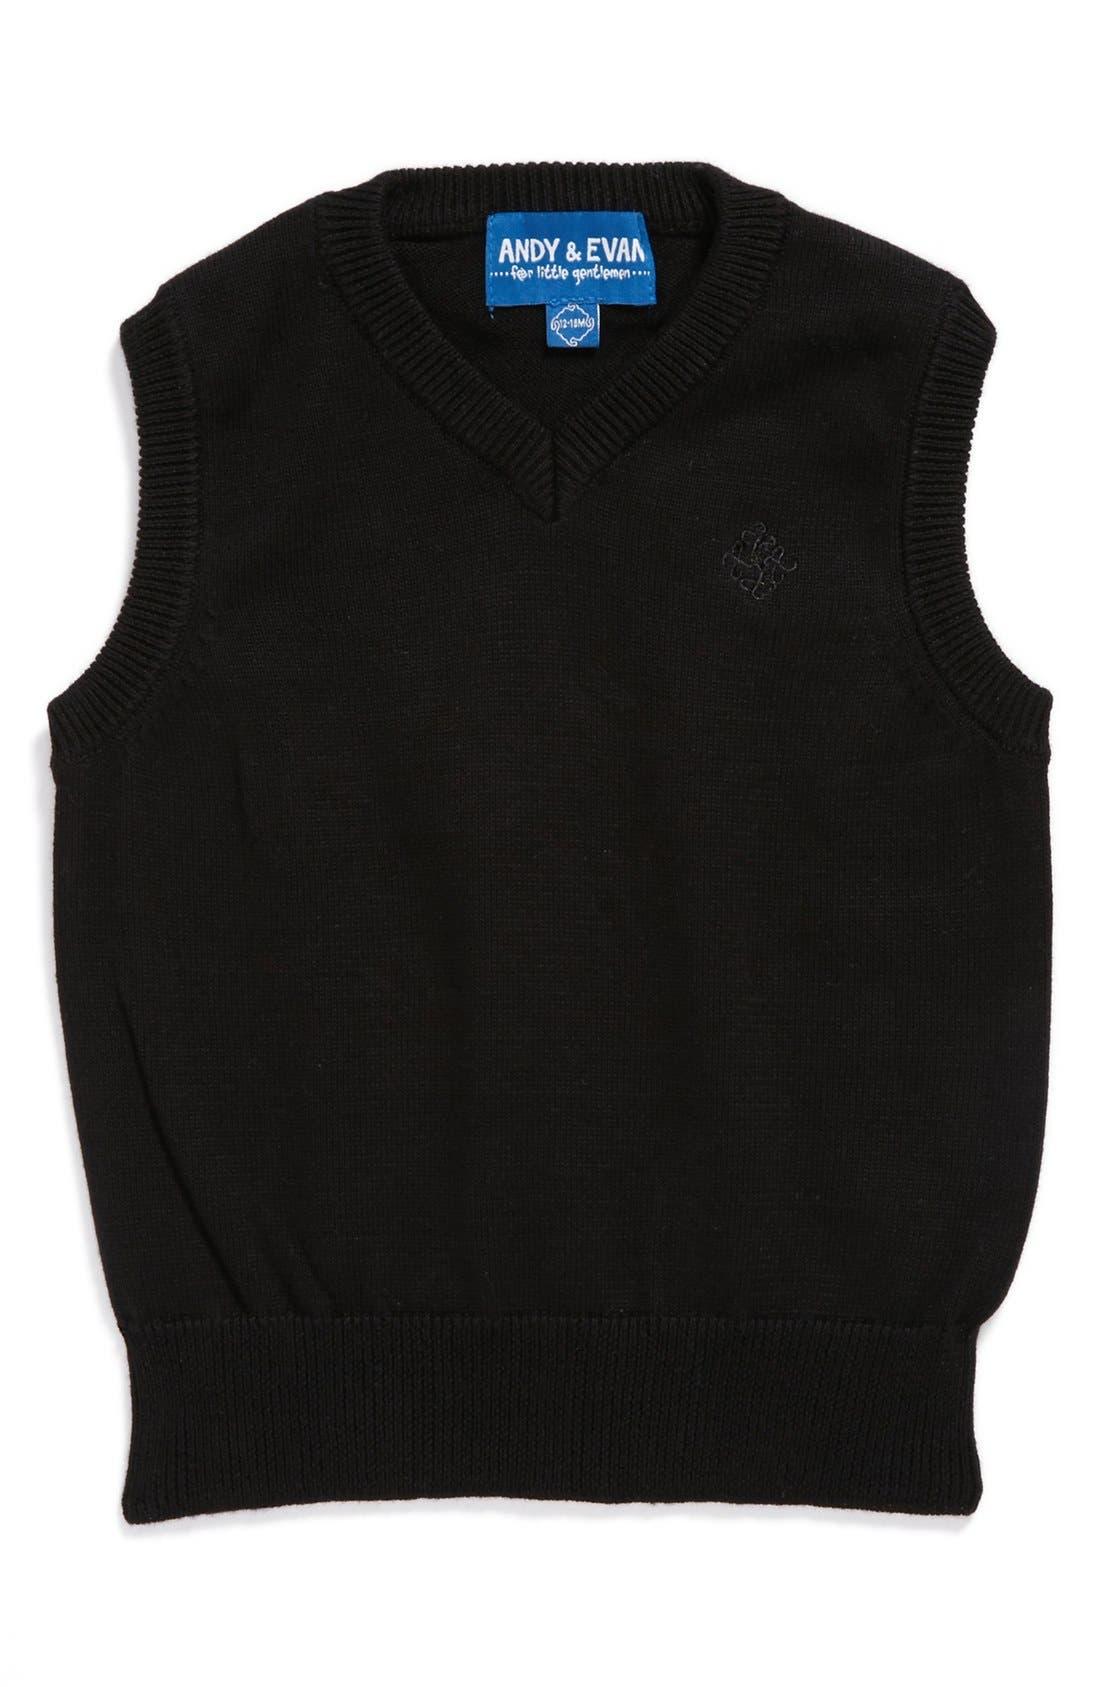 Main Image - Andy & Evan for little gentlemen Sweater Vest (Toddler Boys)